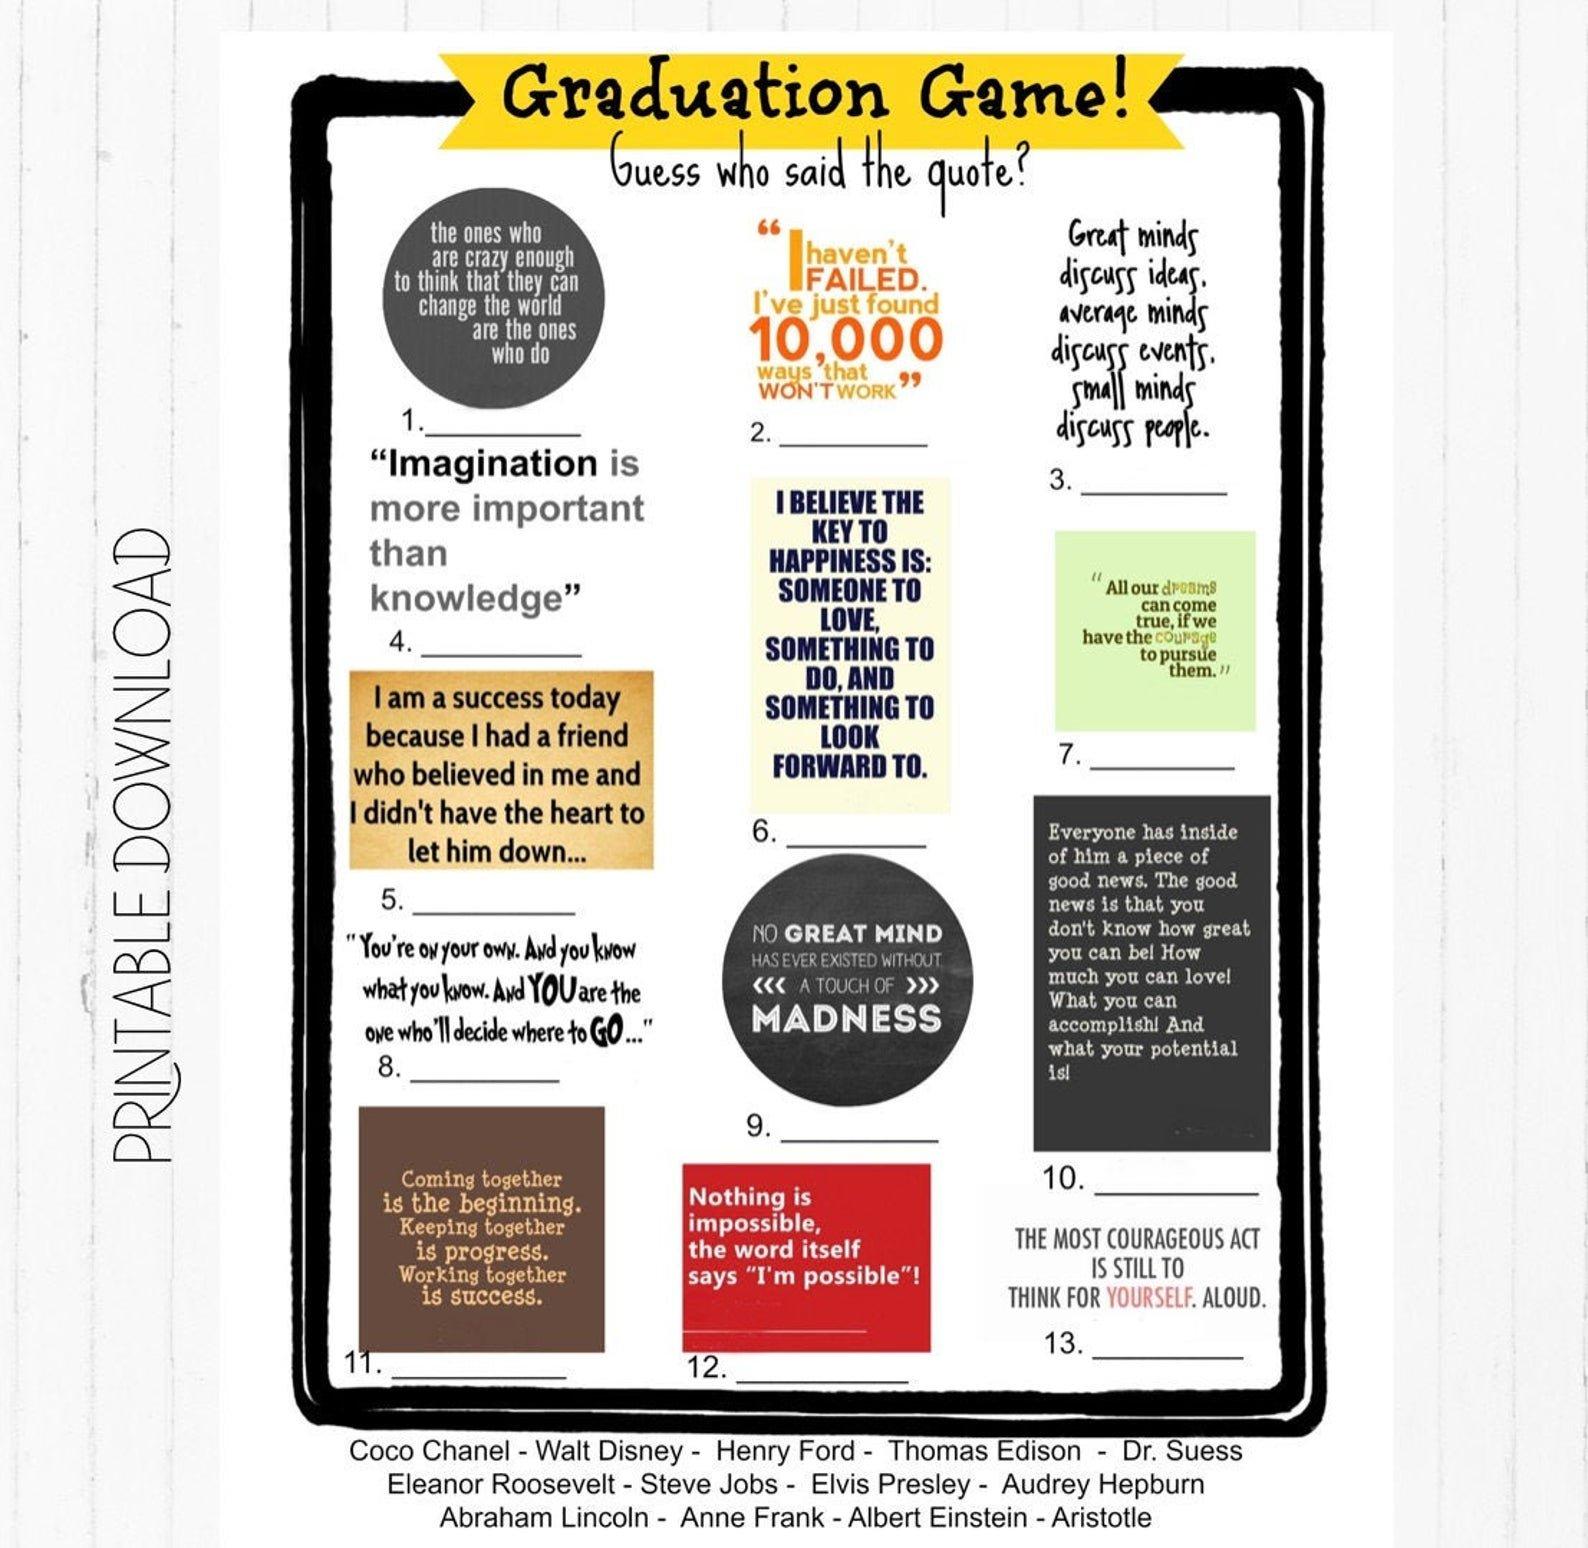 digital copy of a graduation quotes game